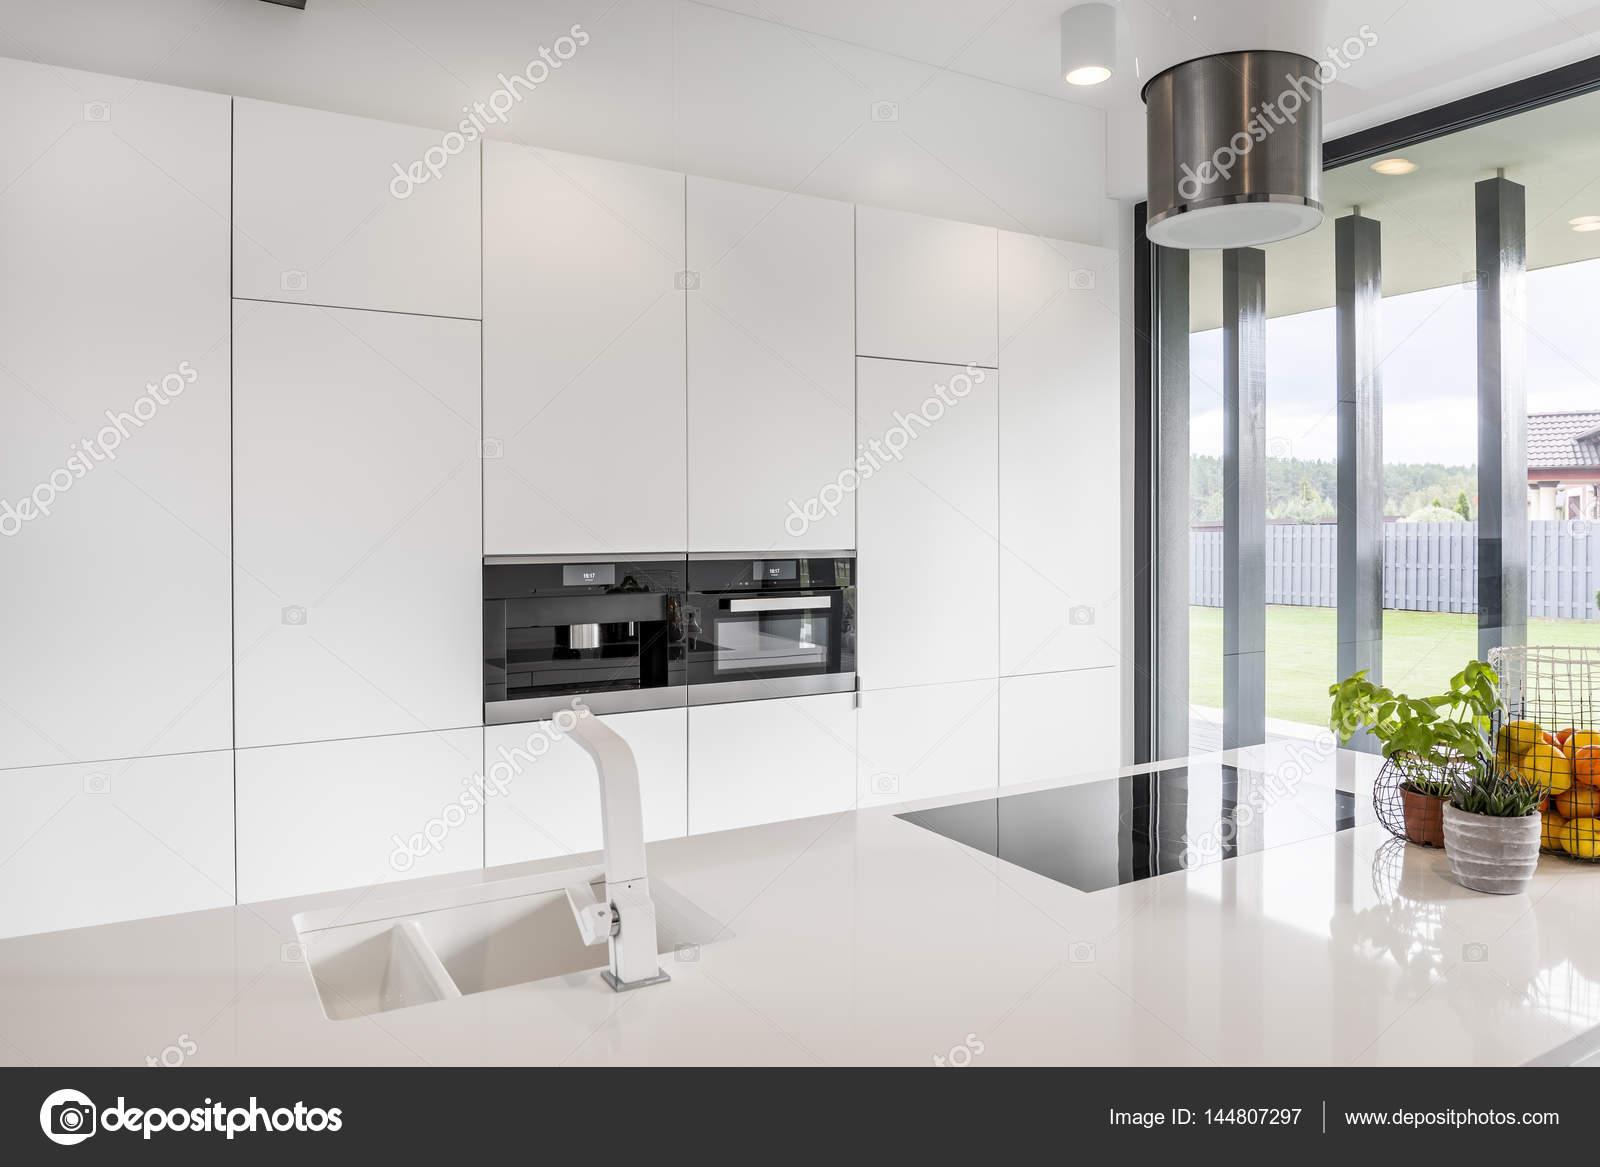 Minimalistische Küche Interieur — Stockfoto © photographee.eu #144807297